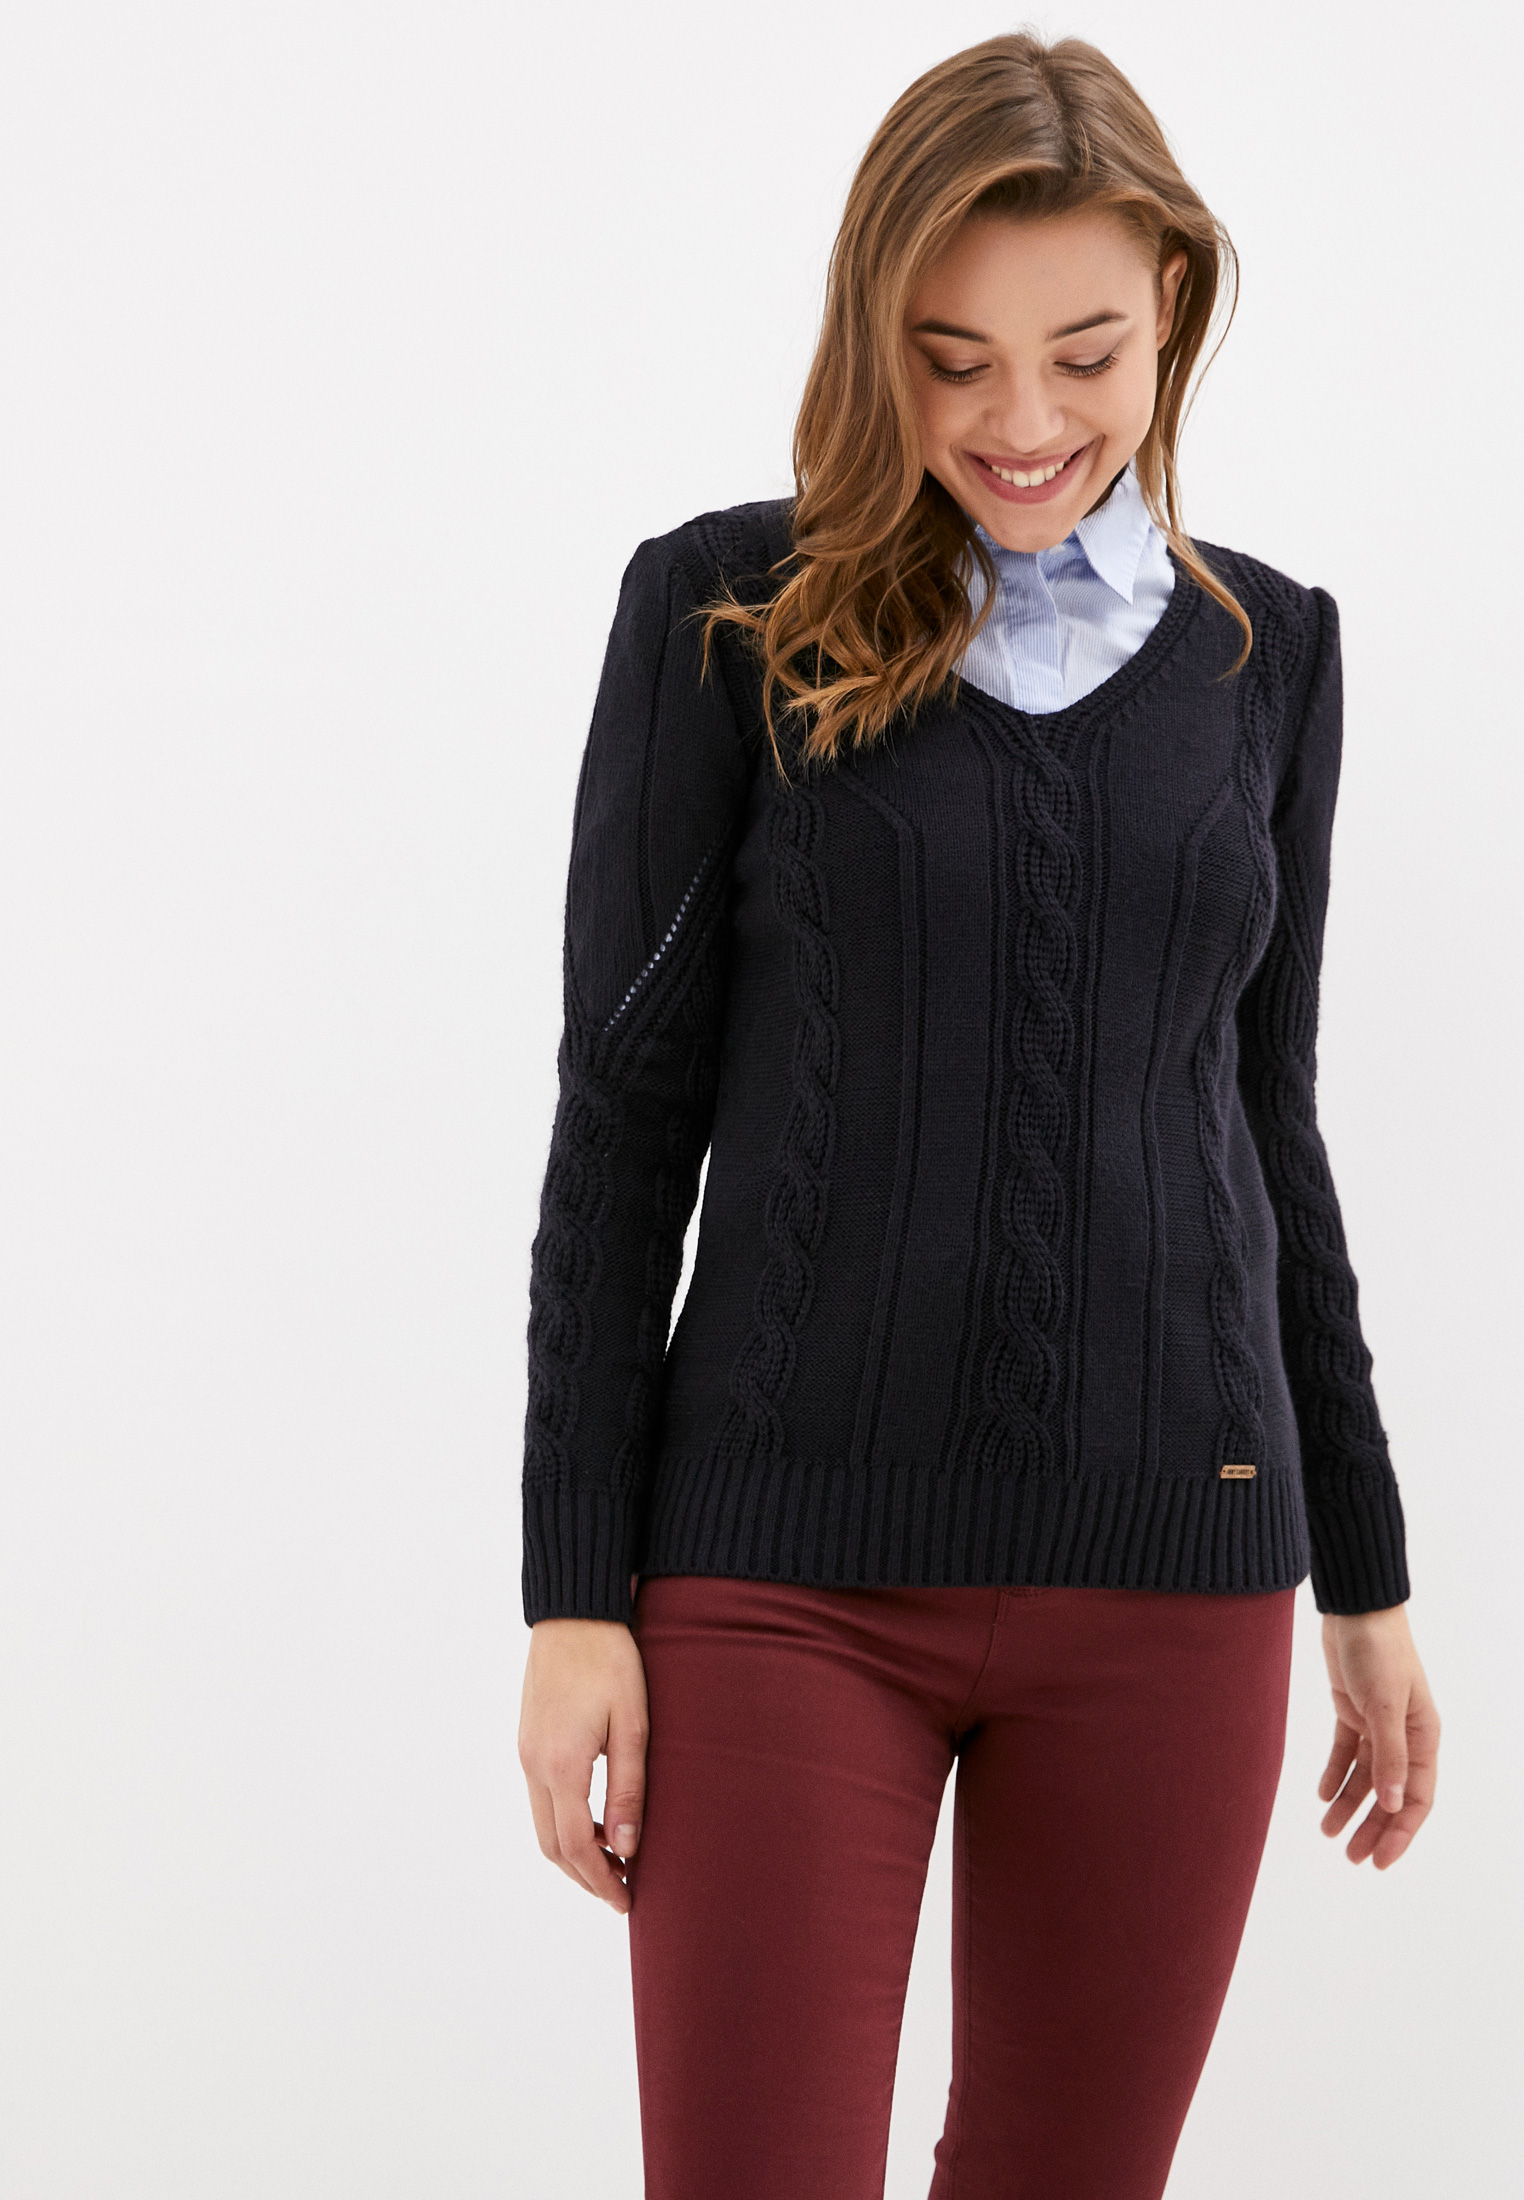 Пуловер JIMMY SANDERS (Джимми Сандерс) 19W KW6061 NAVY